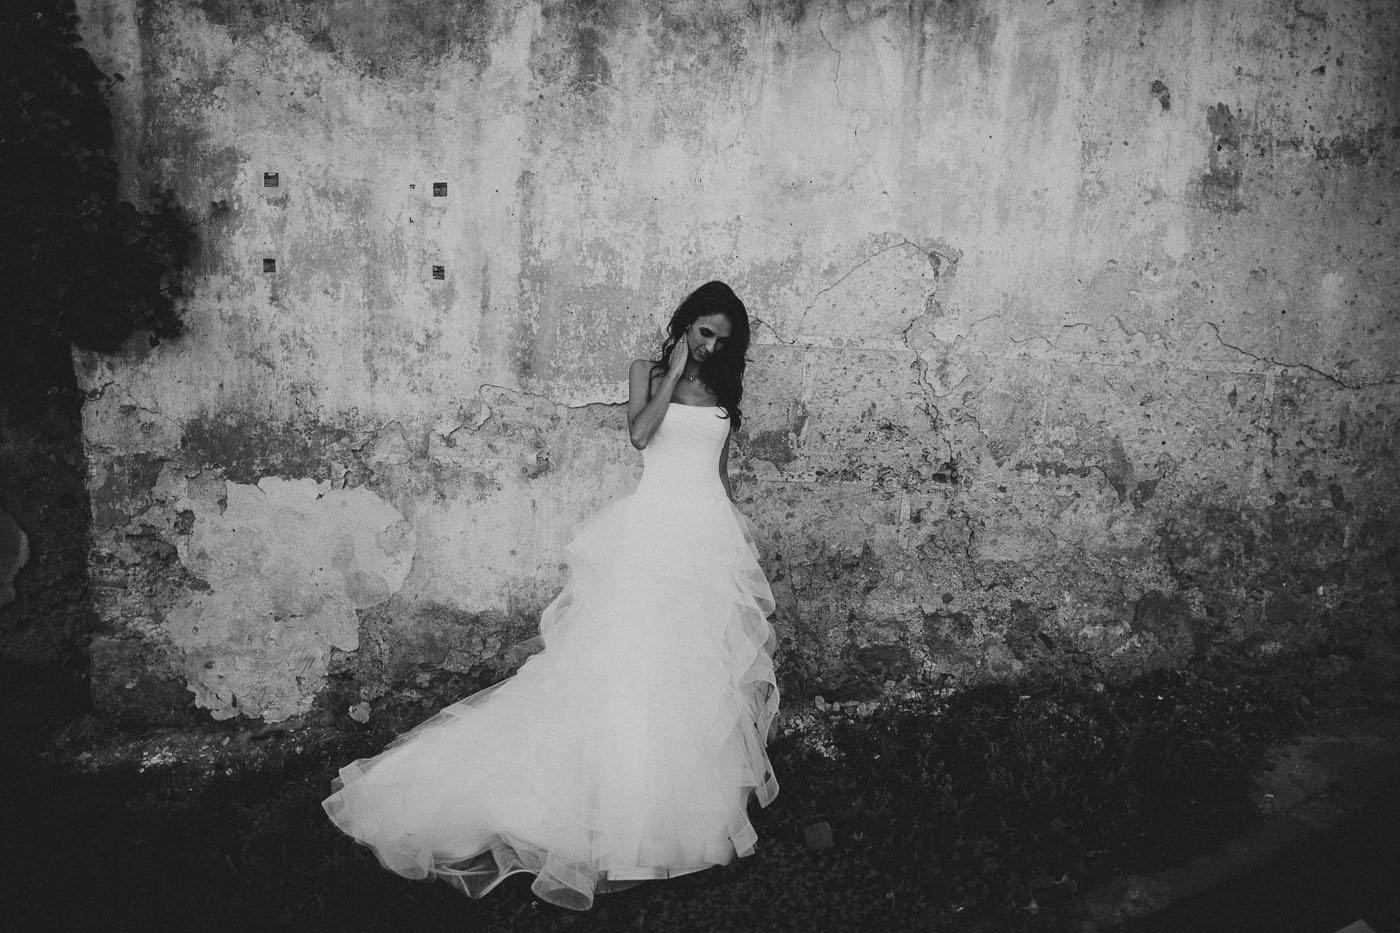 wedding-photographer-walpersdorf-austria-17